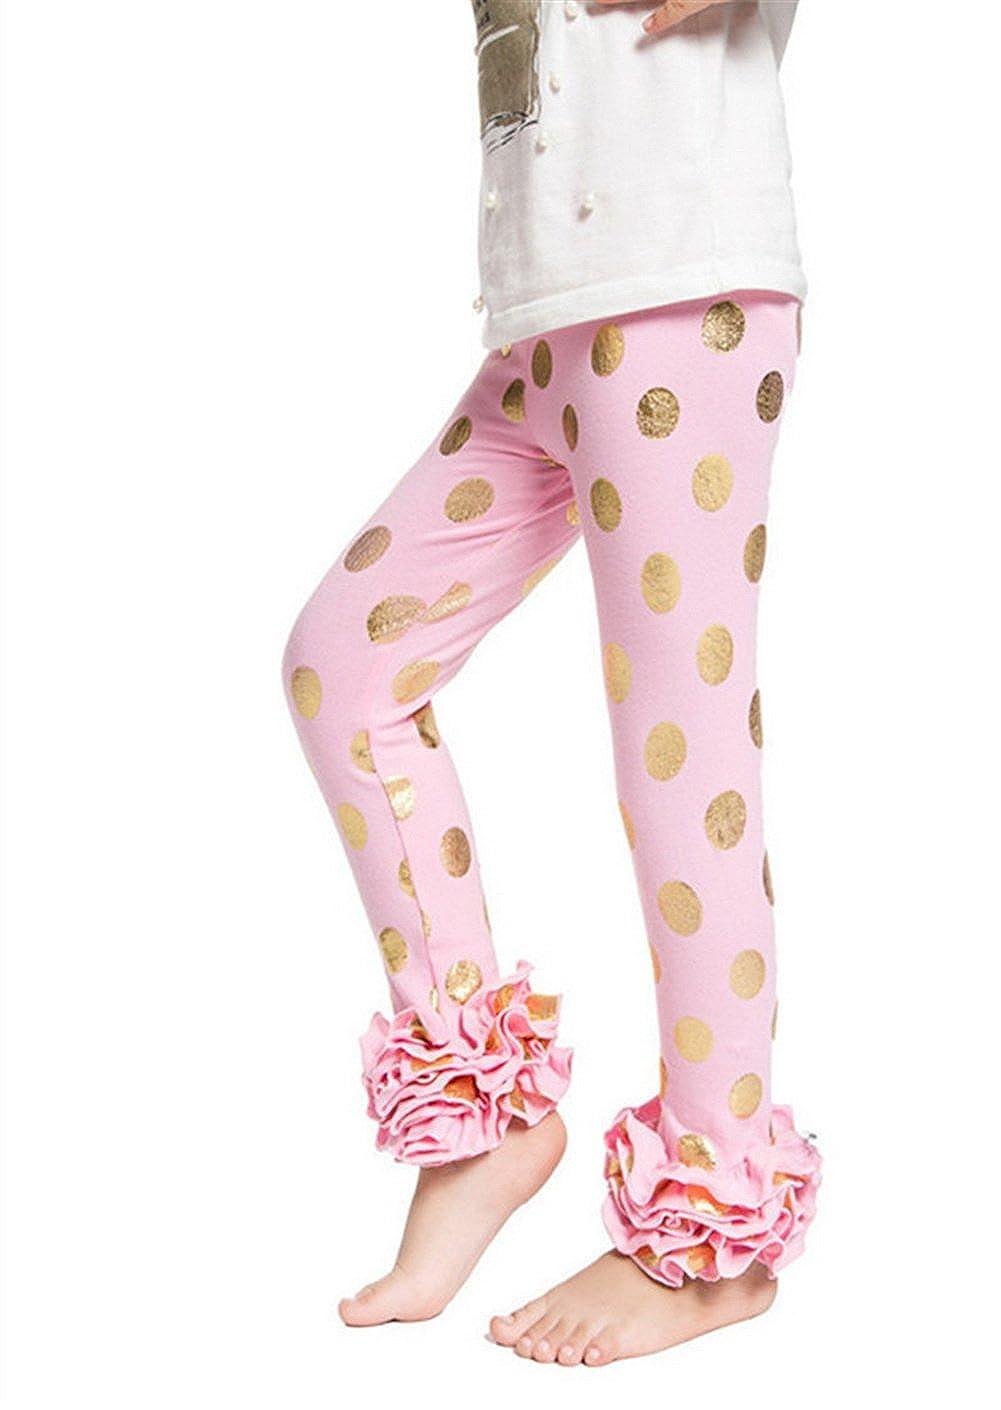 c57b55c3 Amazon.com: Messy Code Baby Girls Ruffle Leggings Pants Toddler Girls Pants  Gold Polka Dot Cotton Ruffle Leggings 0-6 Years: Clothing